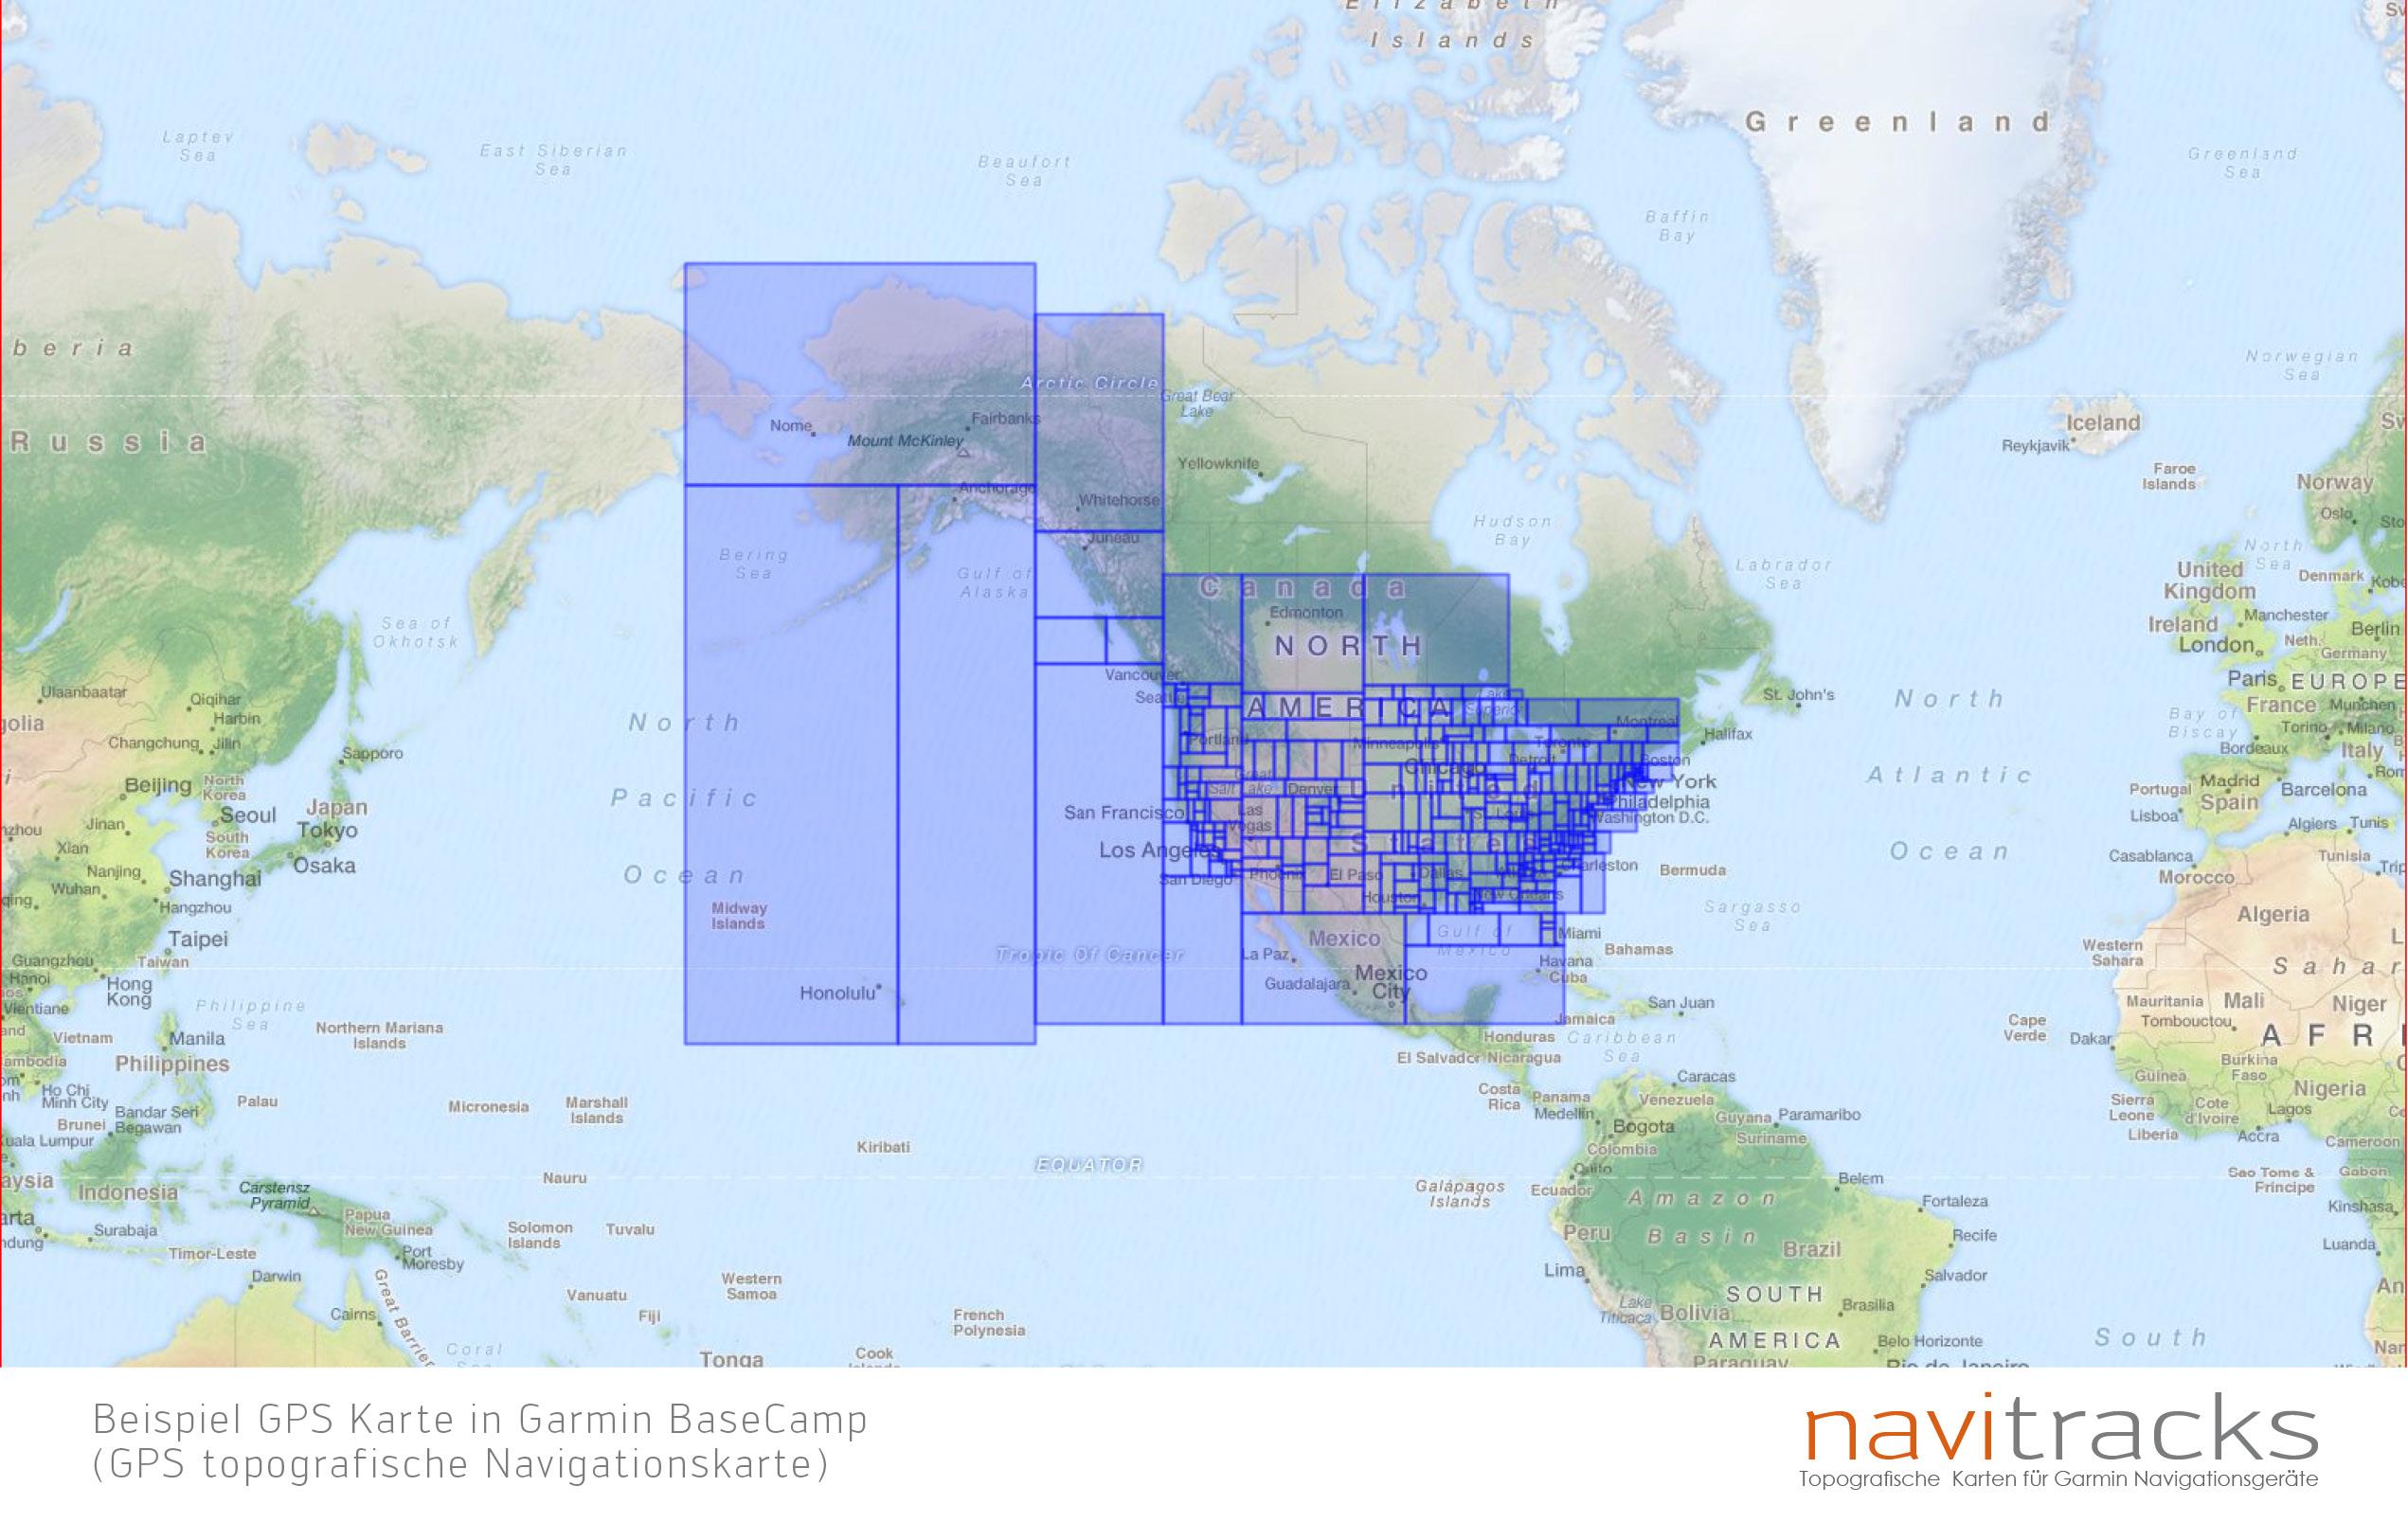 Sim Karte F303274r Usa.Karte Von Amerika